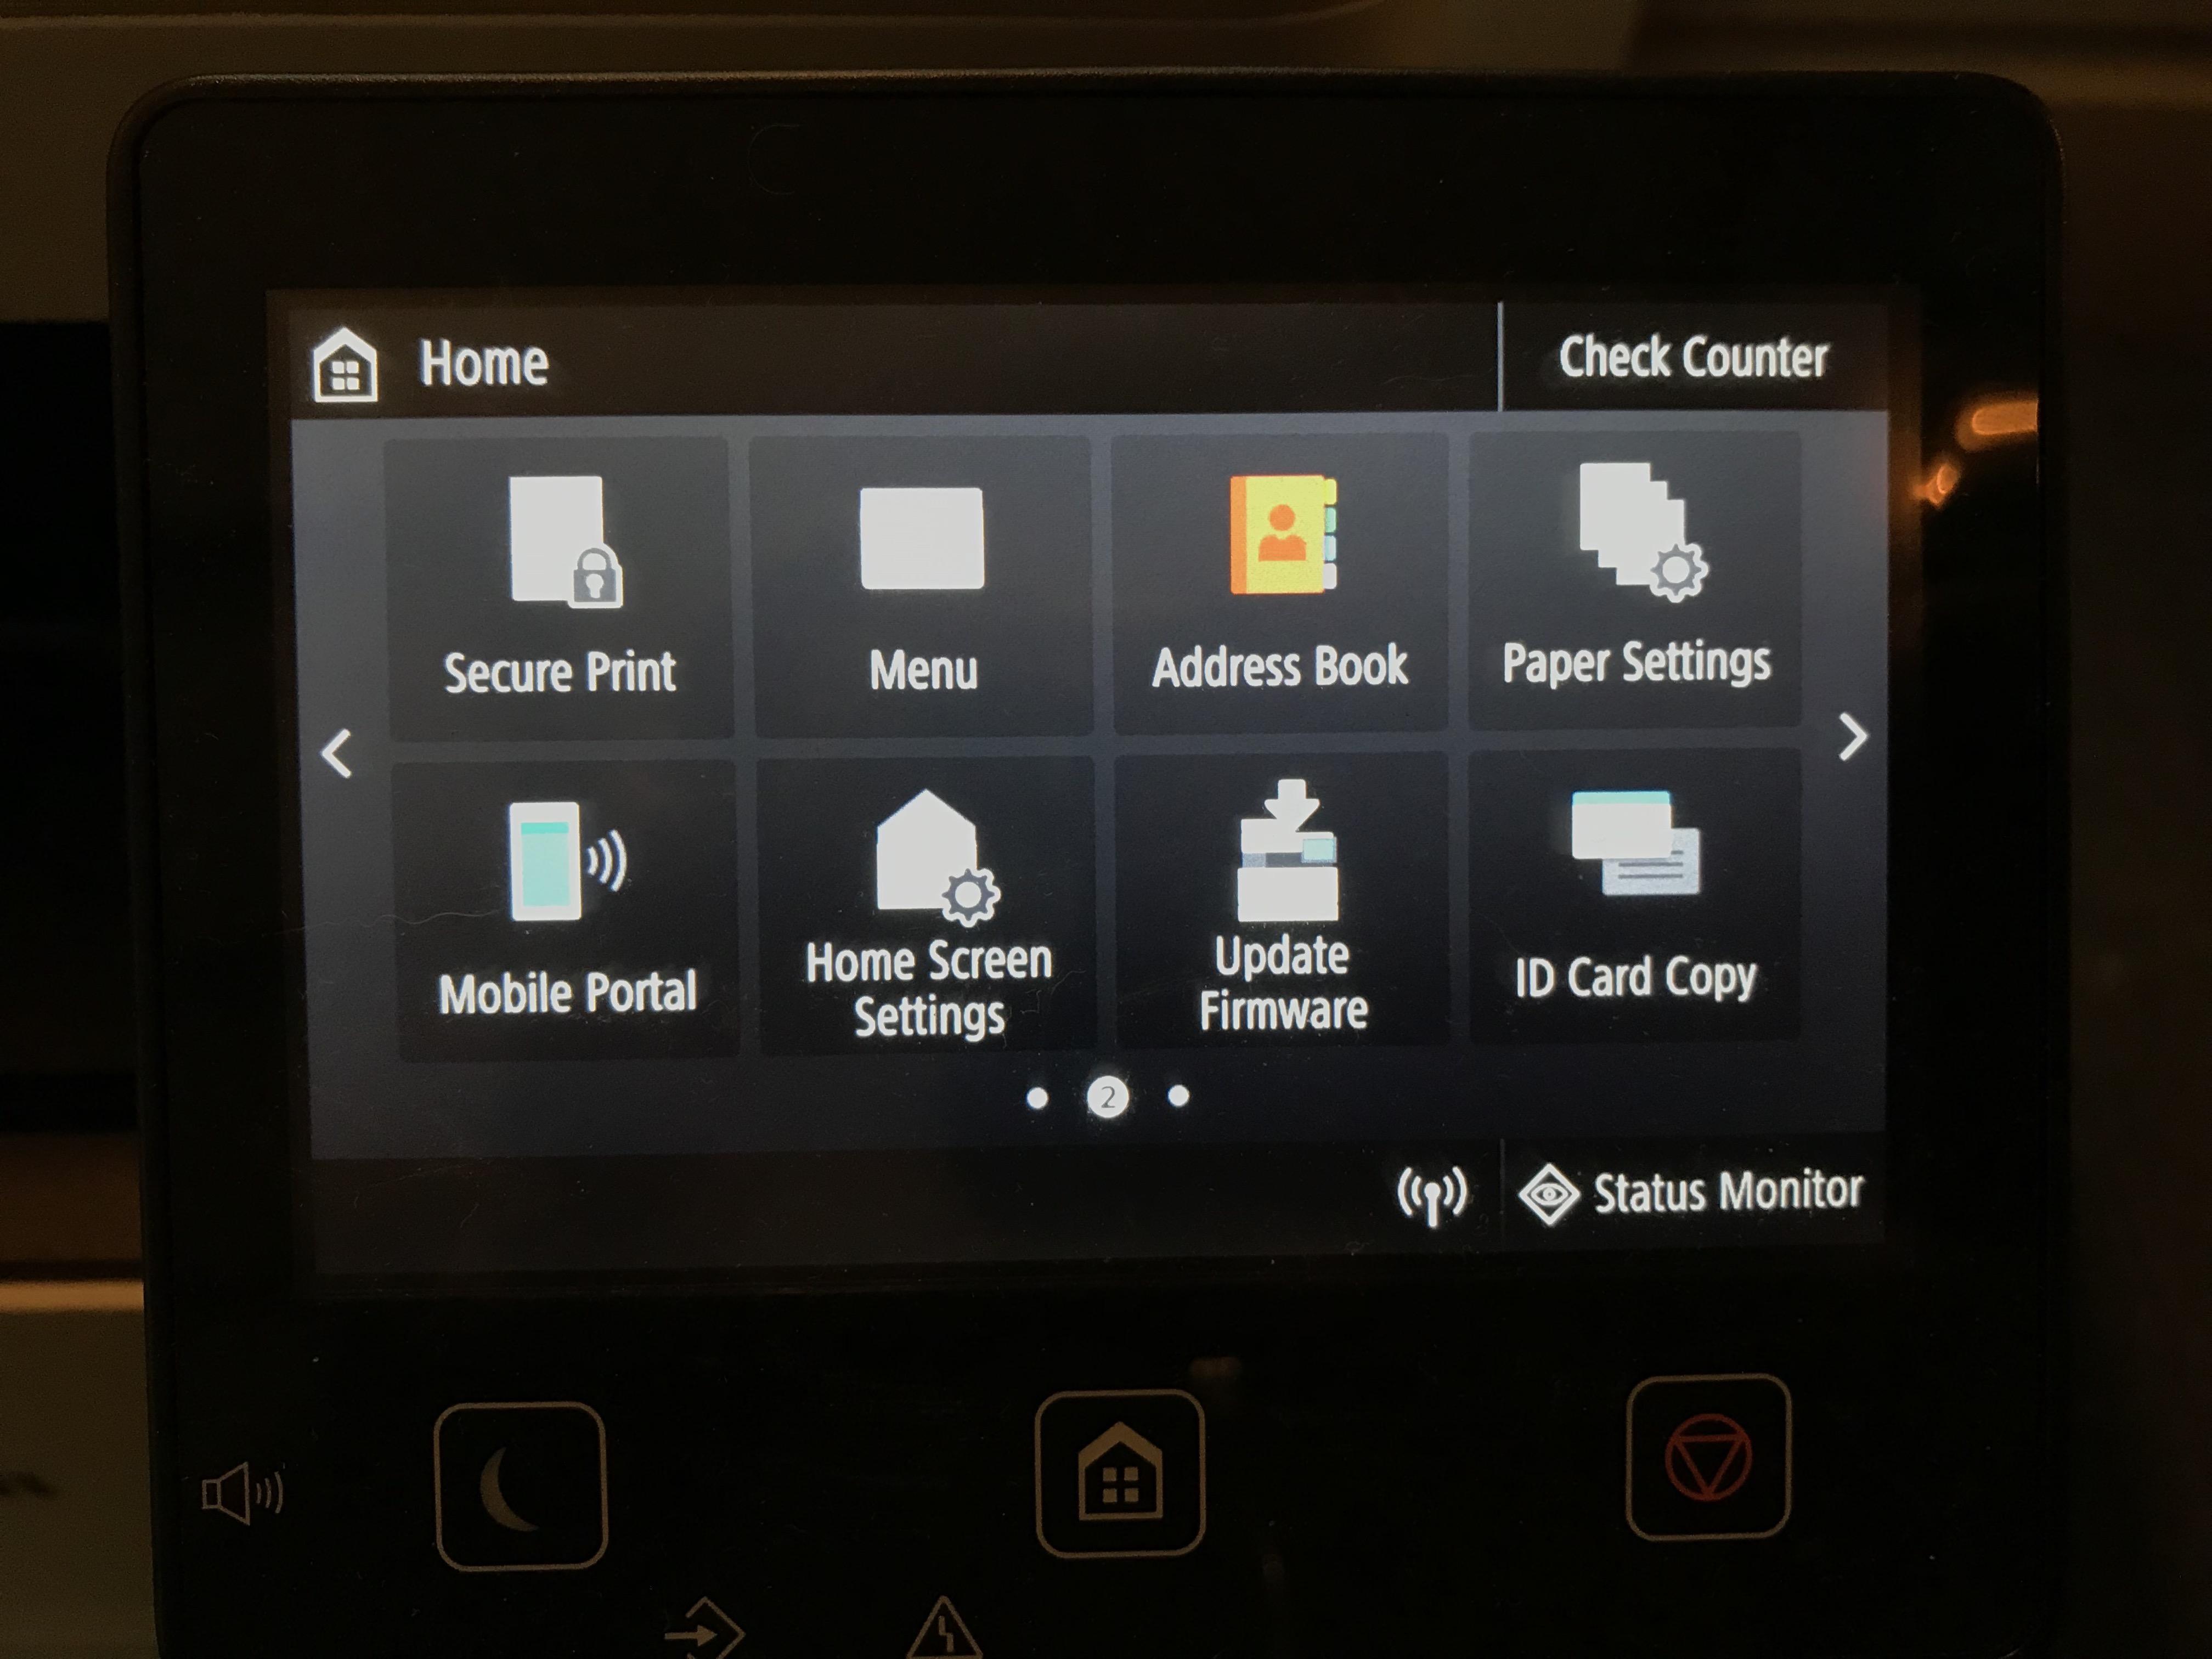 Canon ImageCLASS Colour Wireless Laser Printer Review | Best